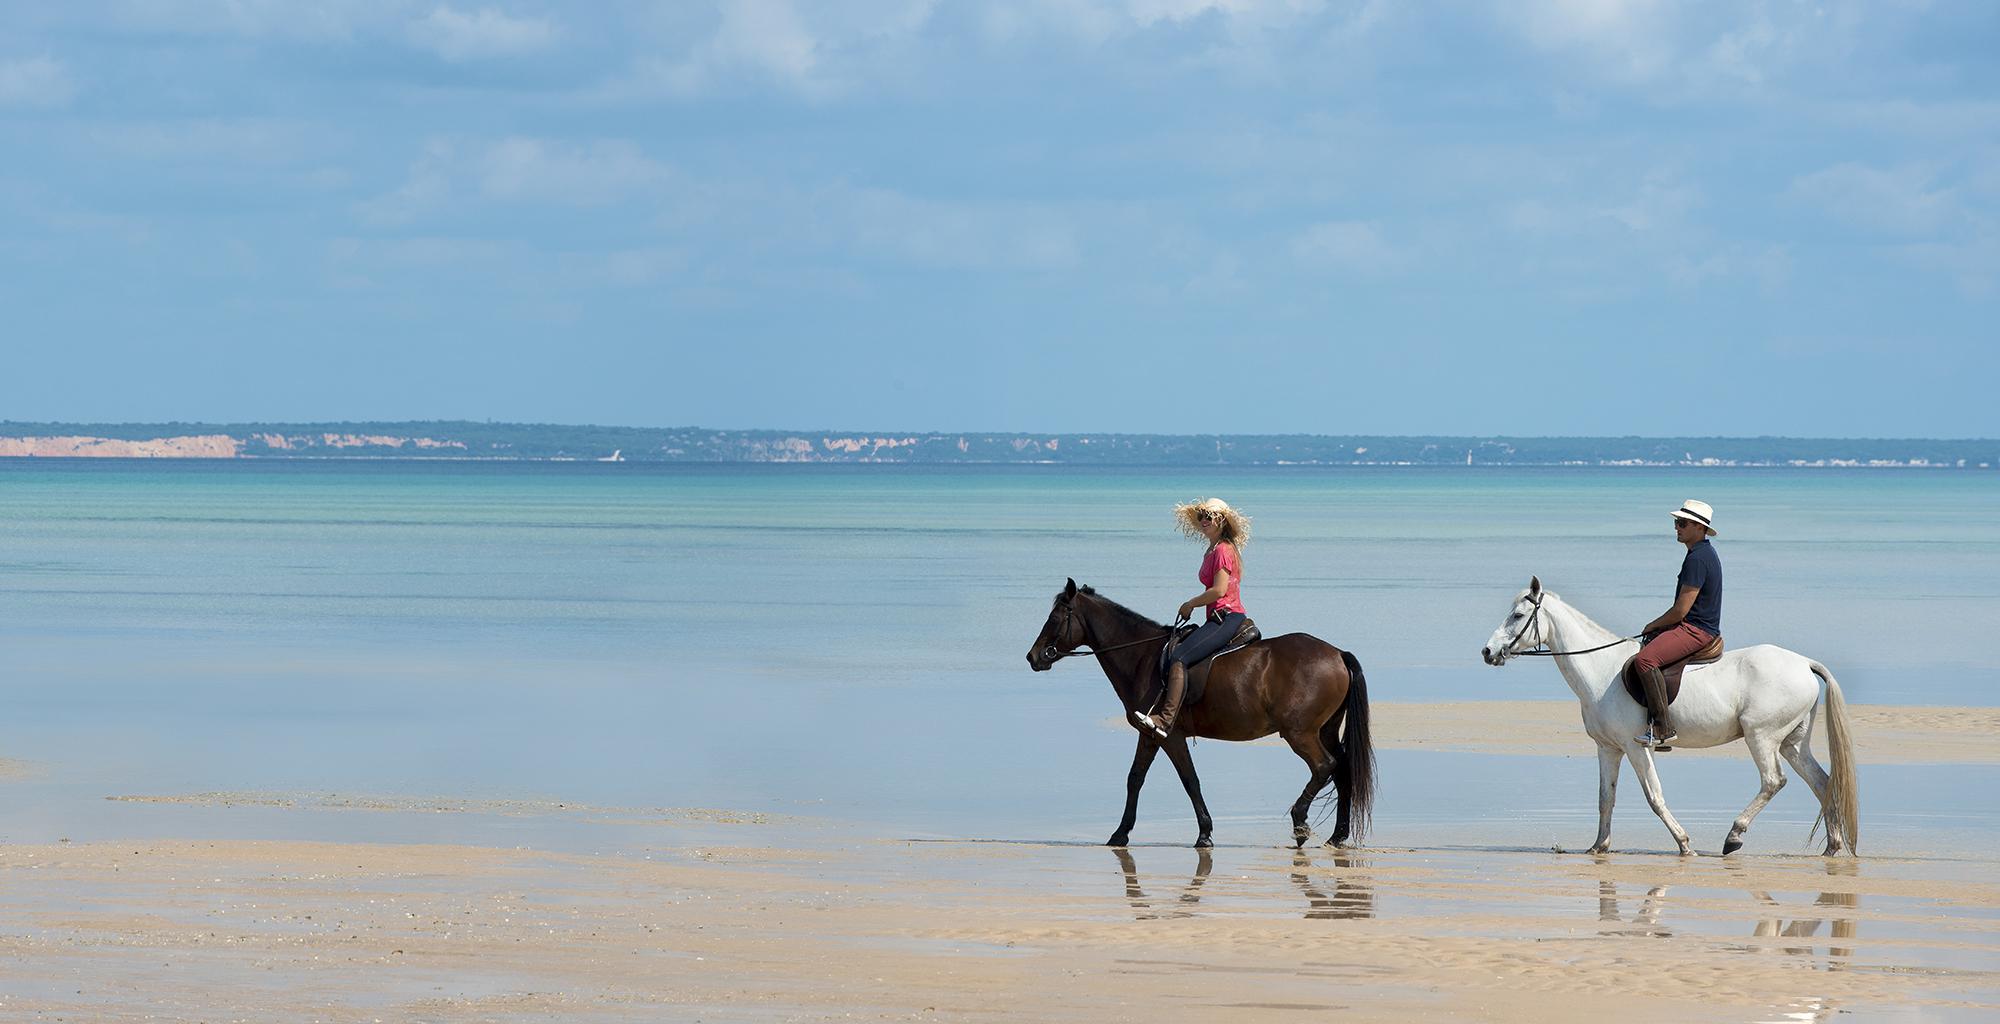 Mozambique-Bazaruto-Archipelago-Benguerra-Island-Lodge-Beach-Ride